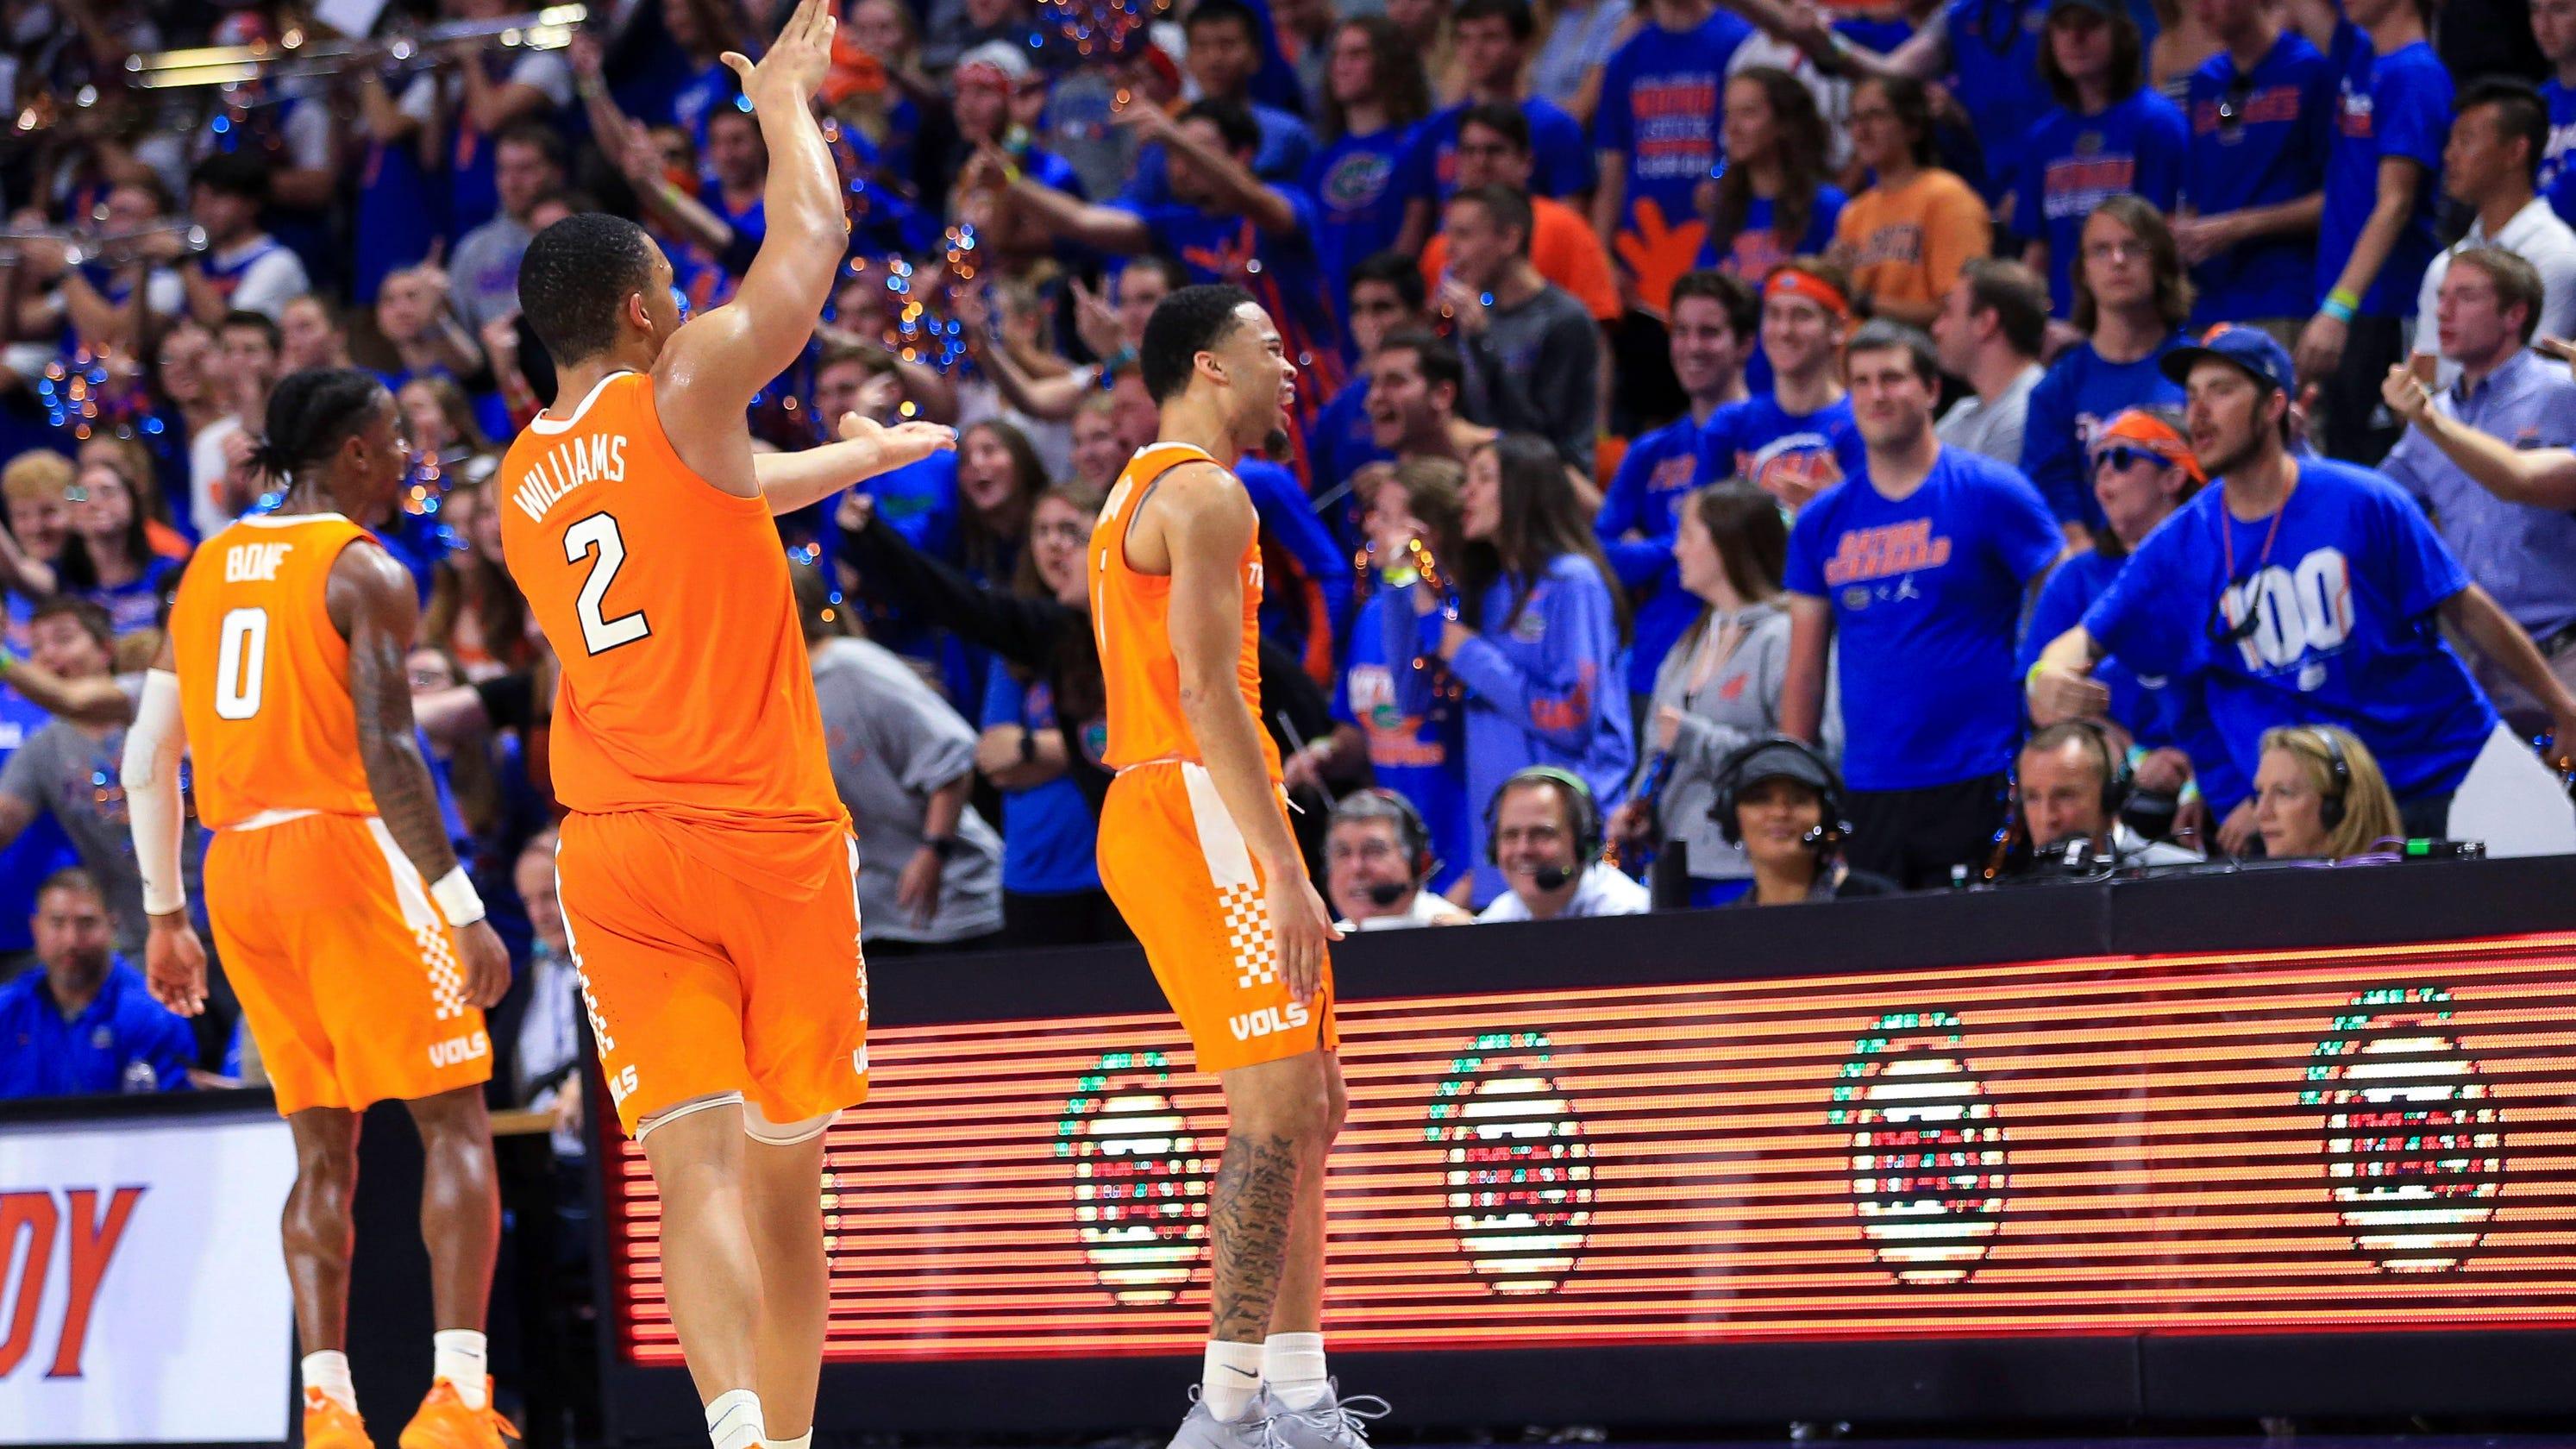 UT Vols  Admiral Schofield explains why Tennessee basketball did Gator  chomp vs Florida 80ec67c8d